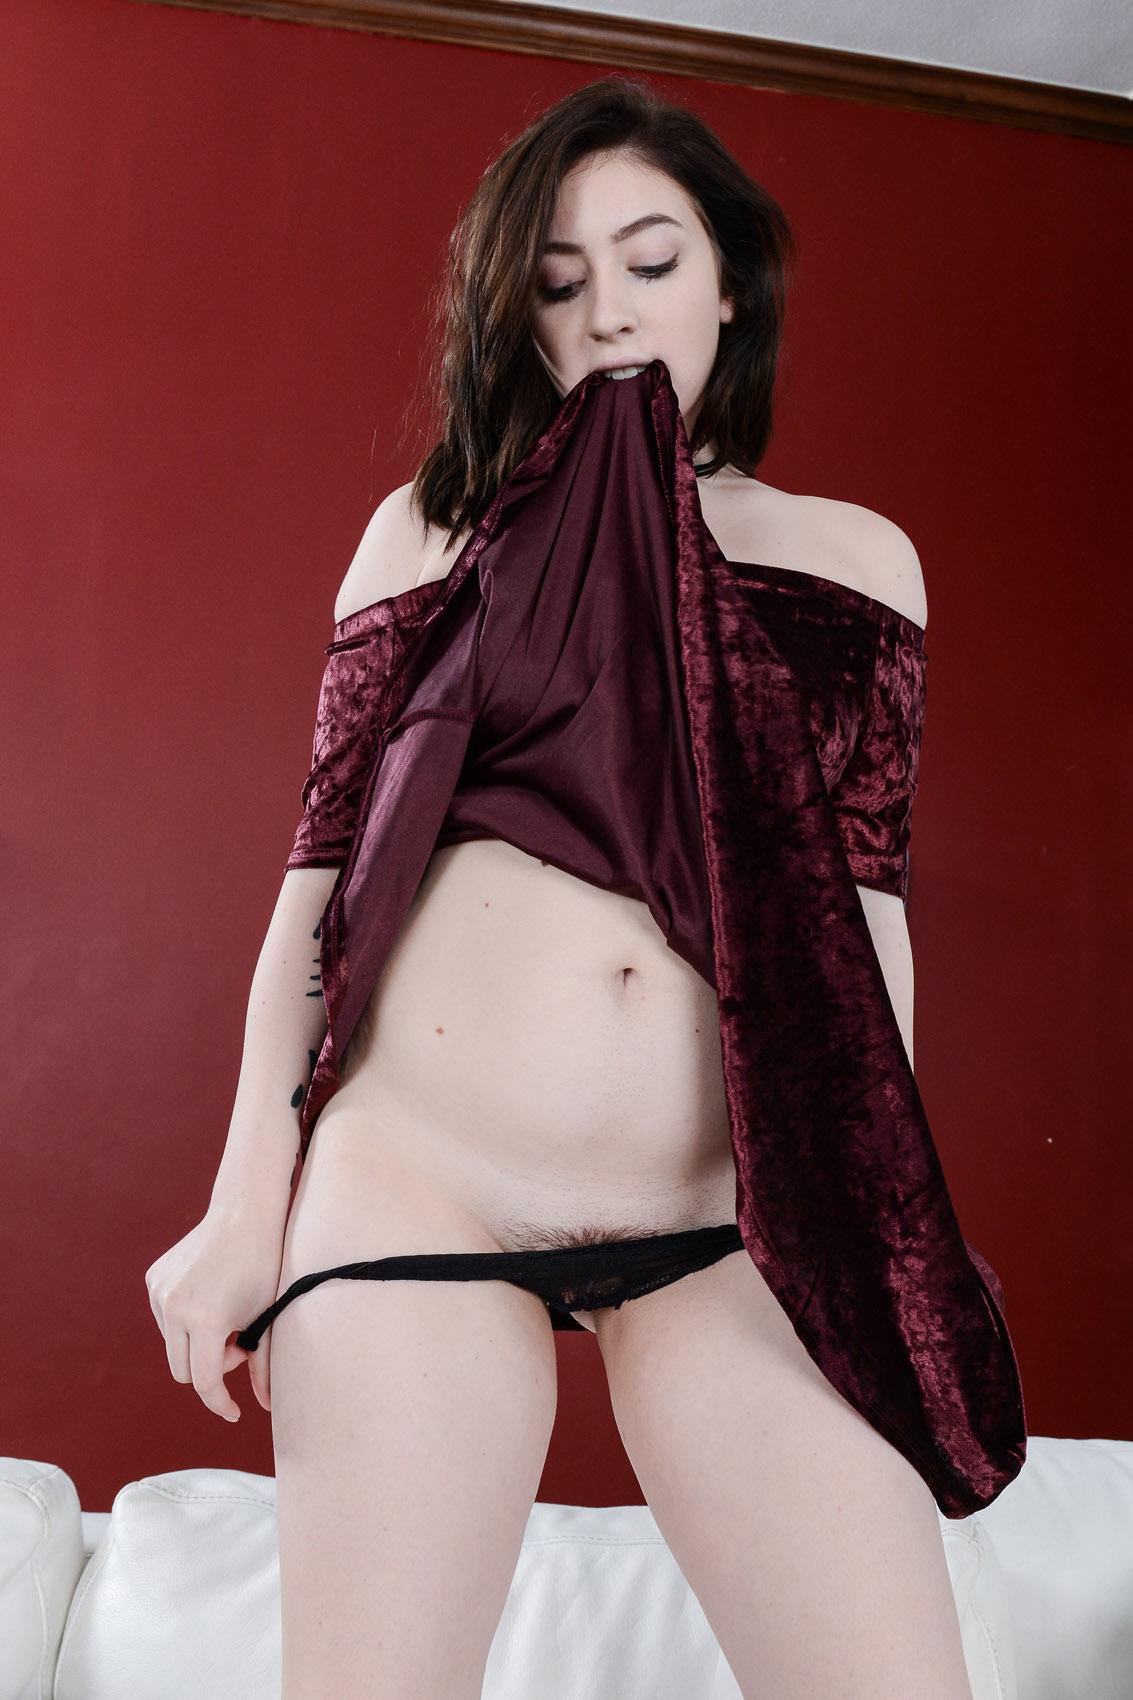 Amilia Onyx Perfect Trimmed Pussy AMKingdom pics and vids ...